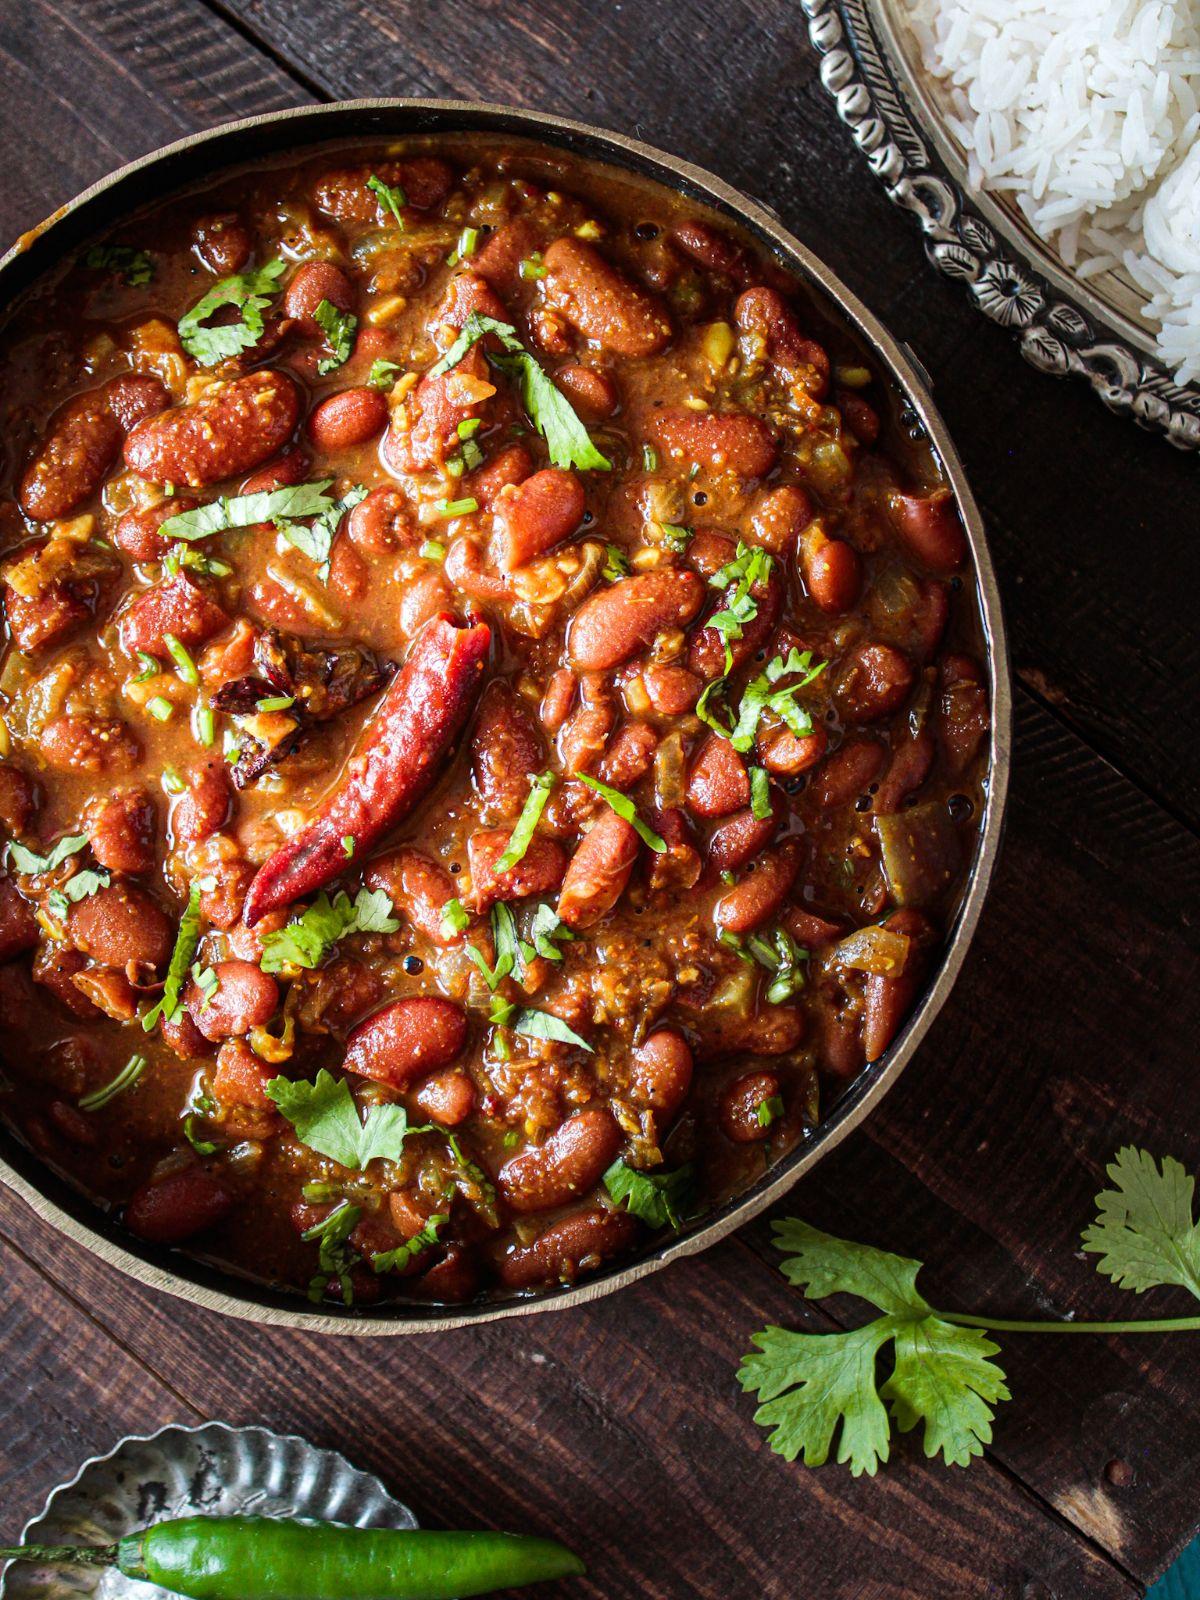 Ready to Eat Rajma Masala with rice